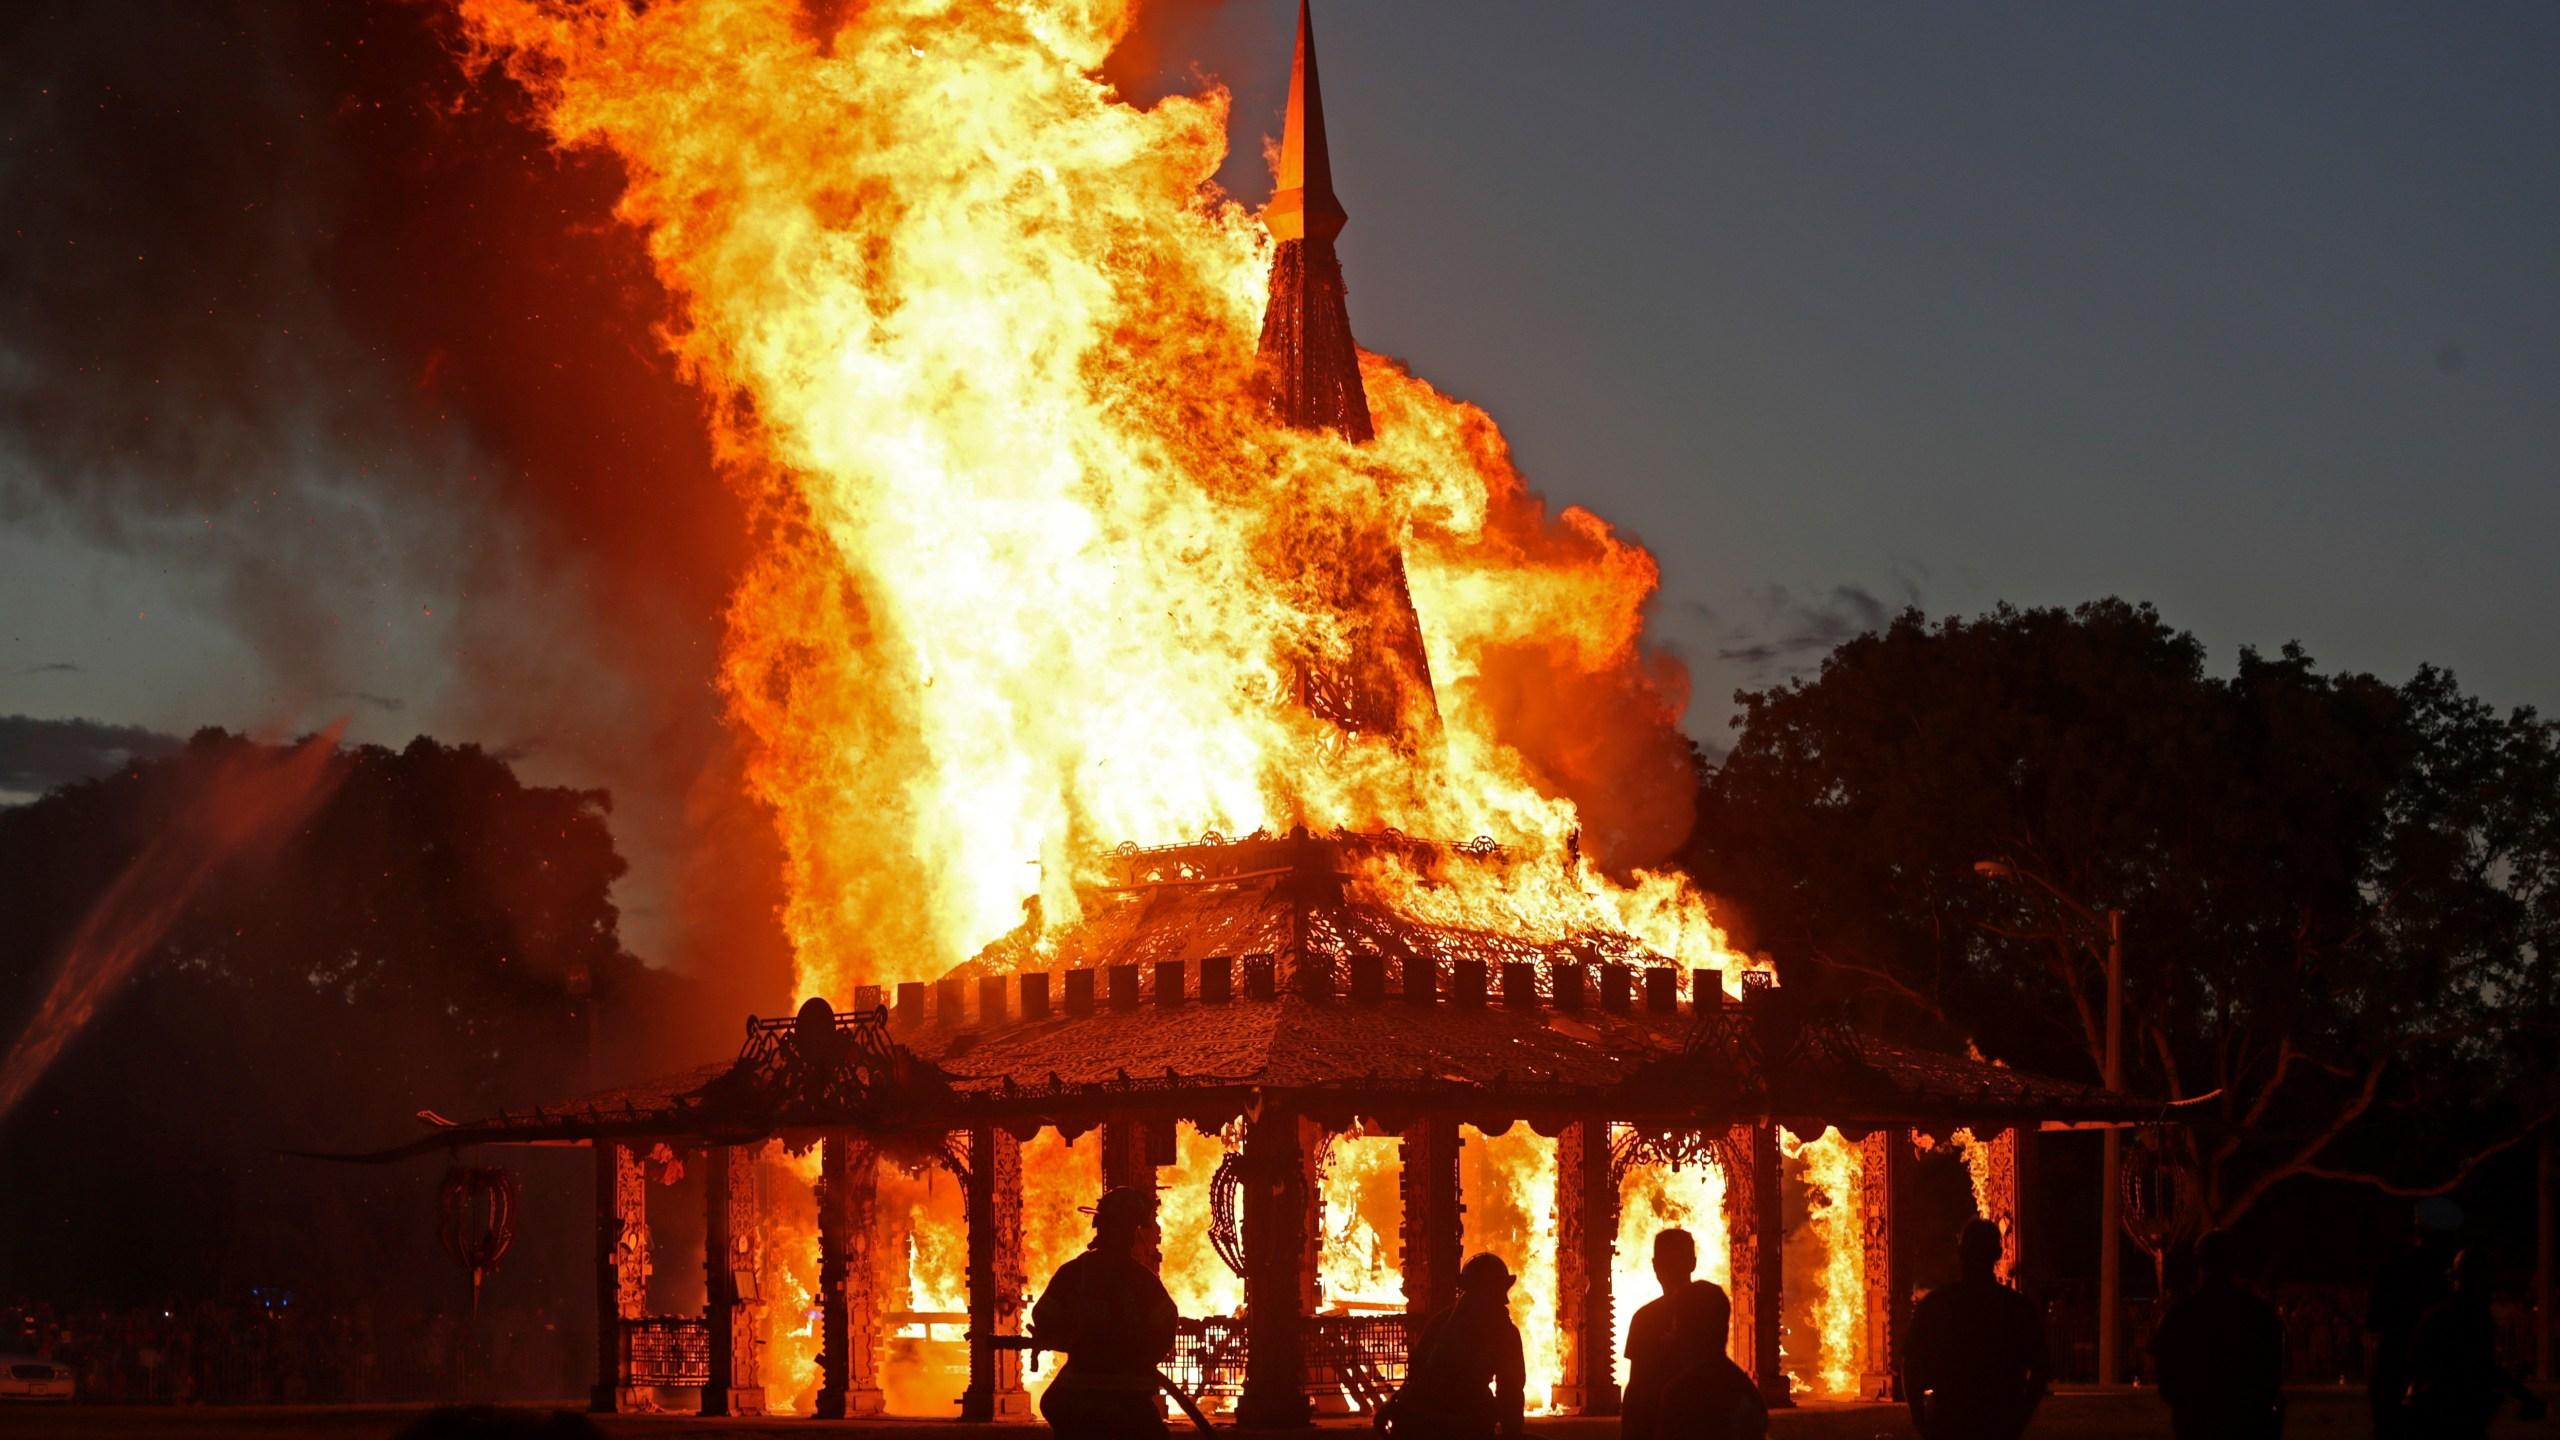 School Shooting Florida Temple Burning_1558334020445